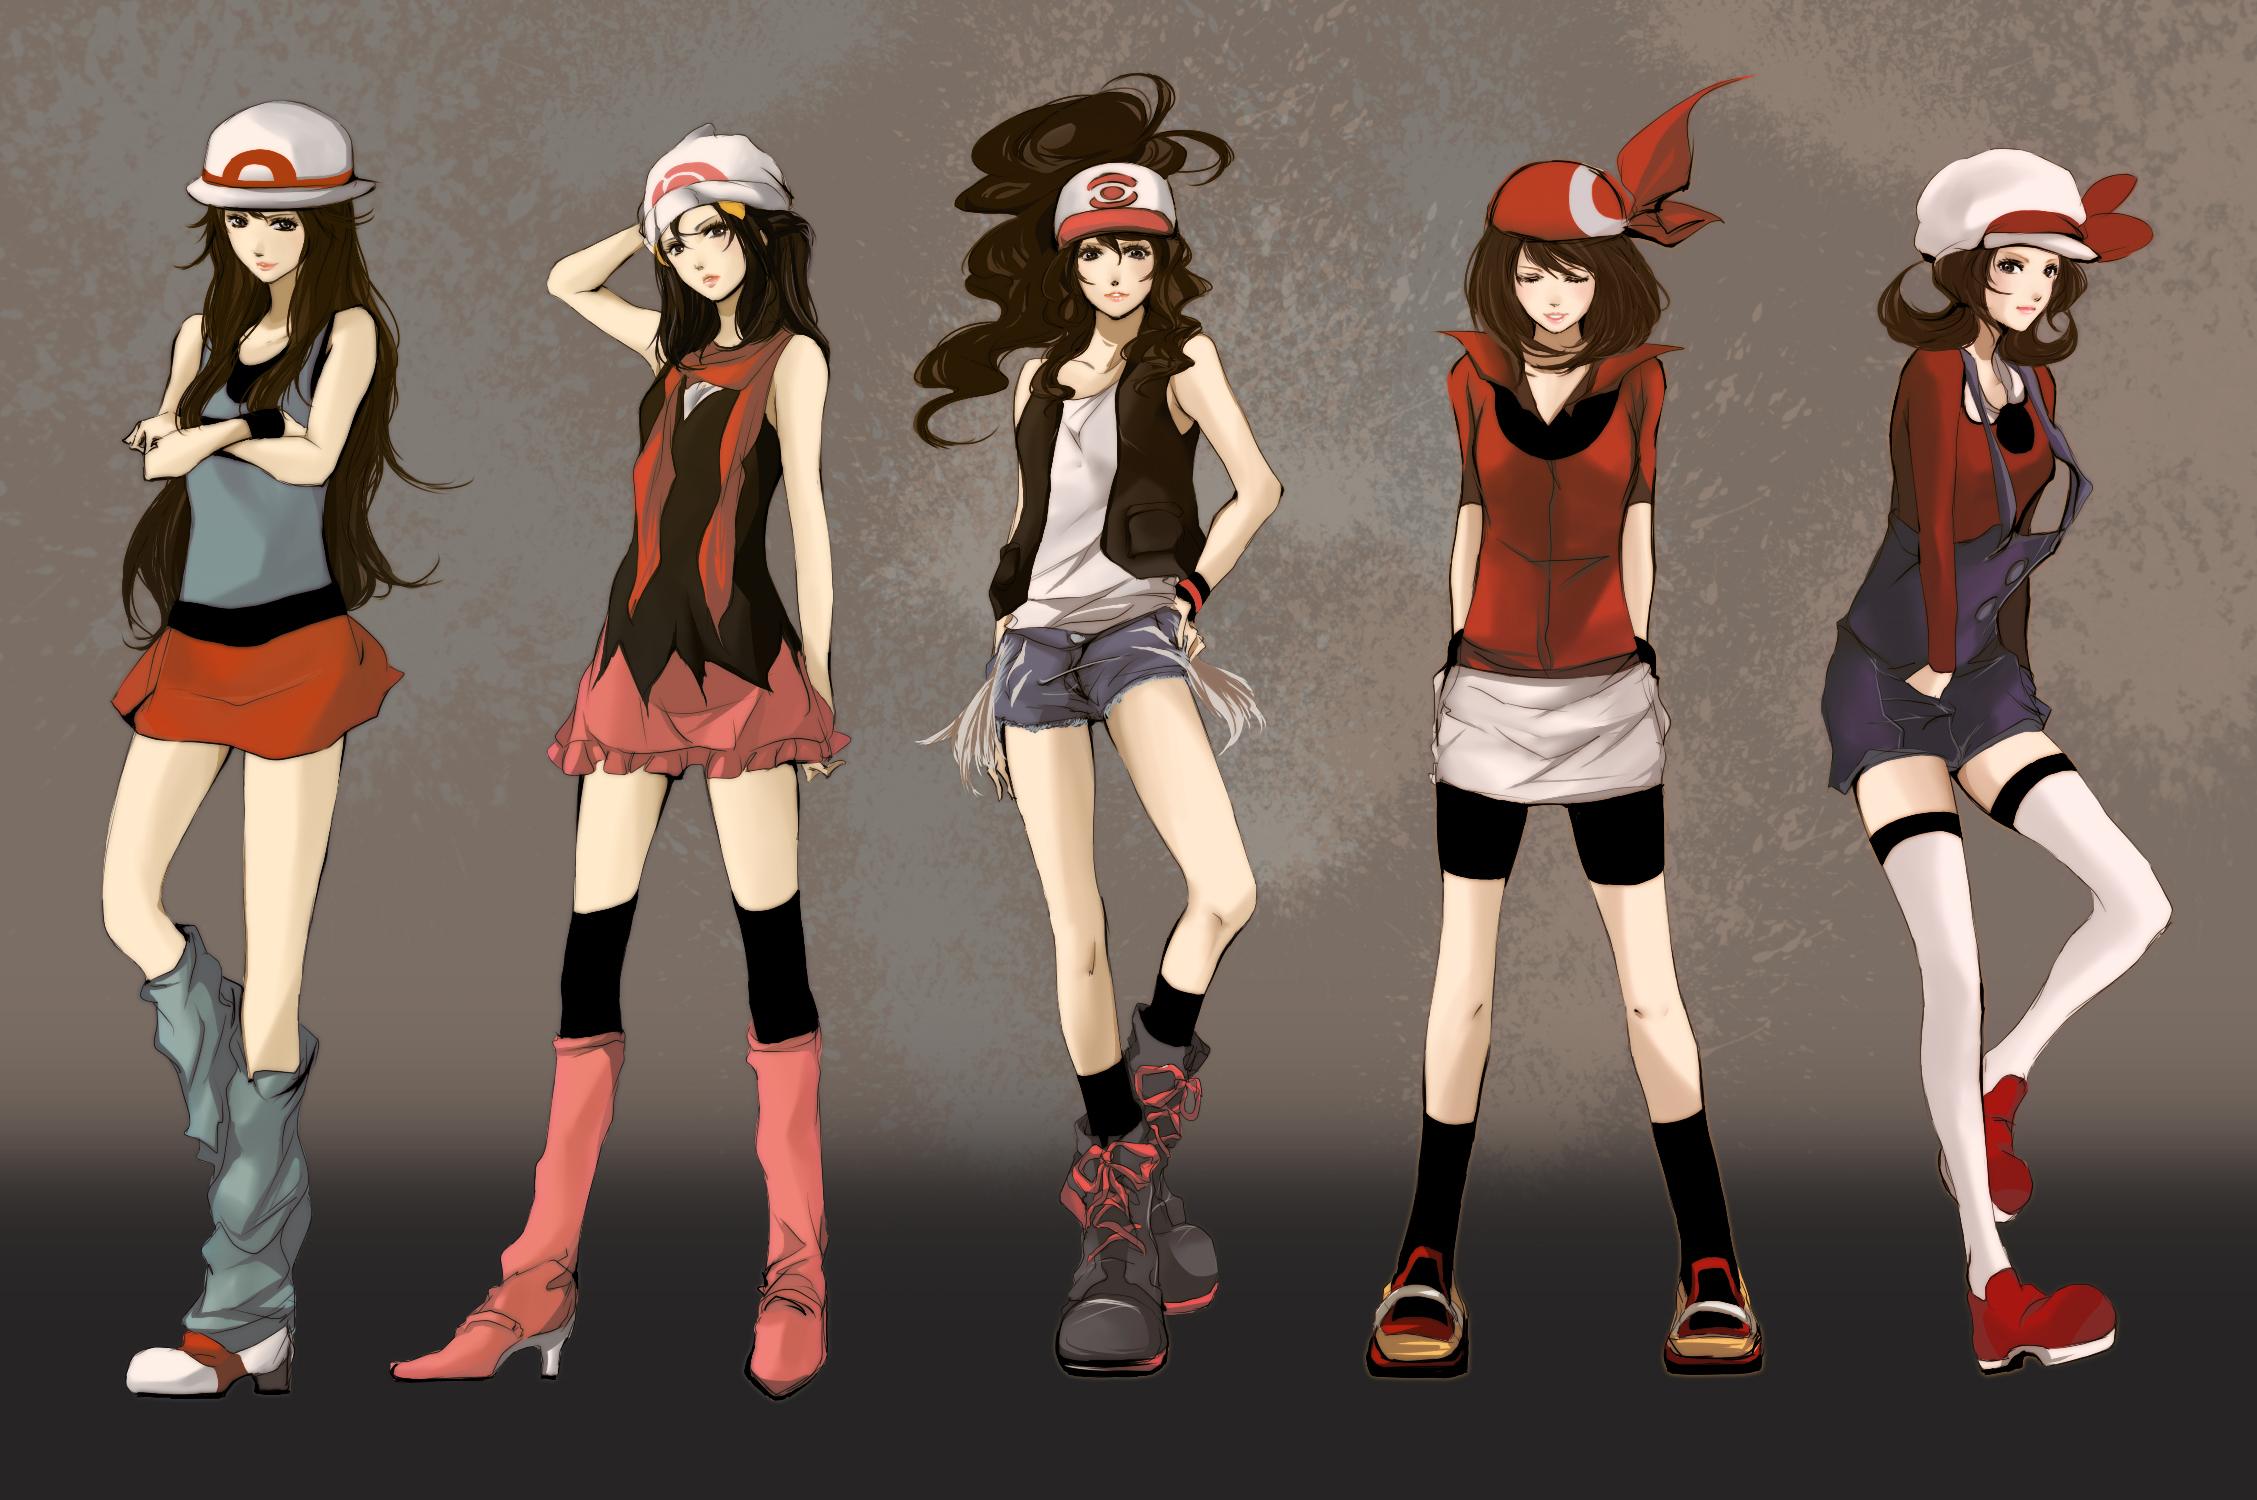 Pokemon women